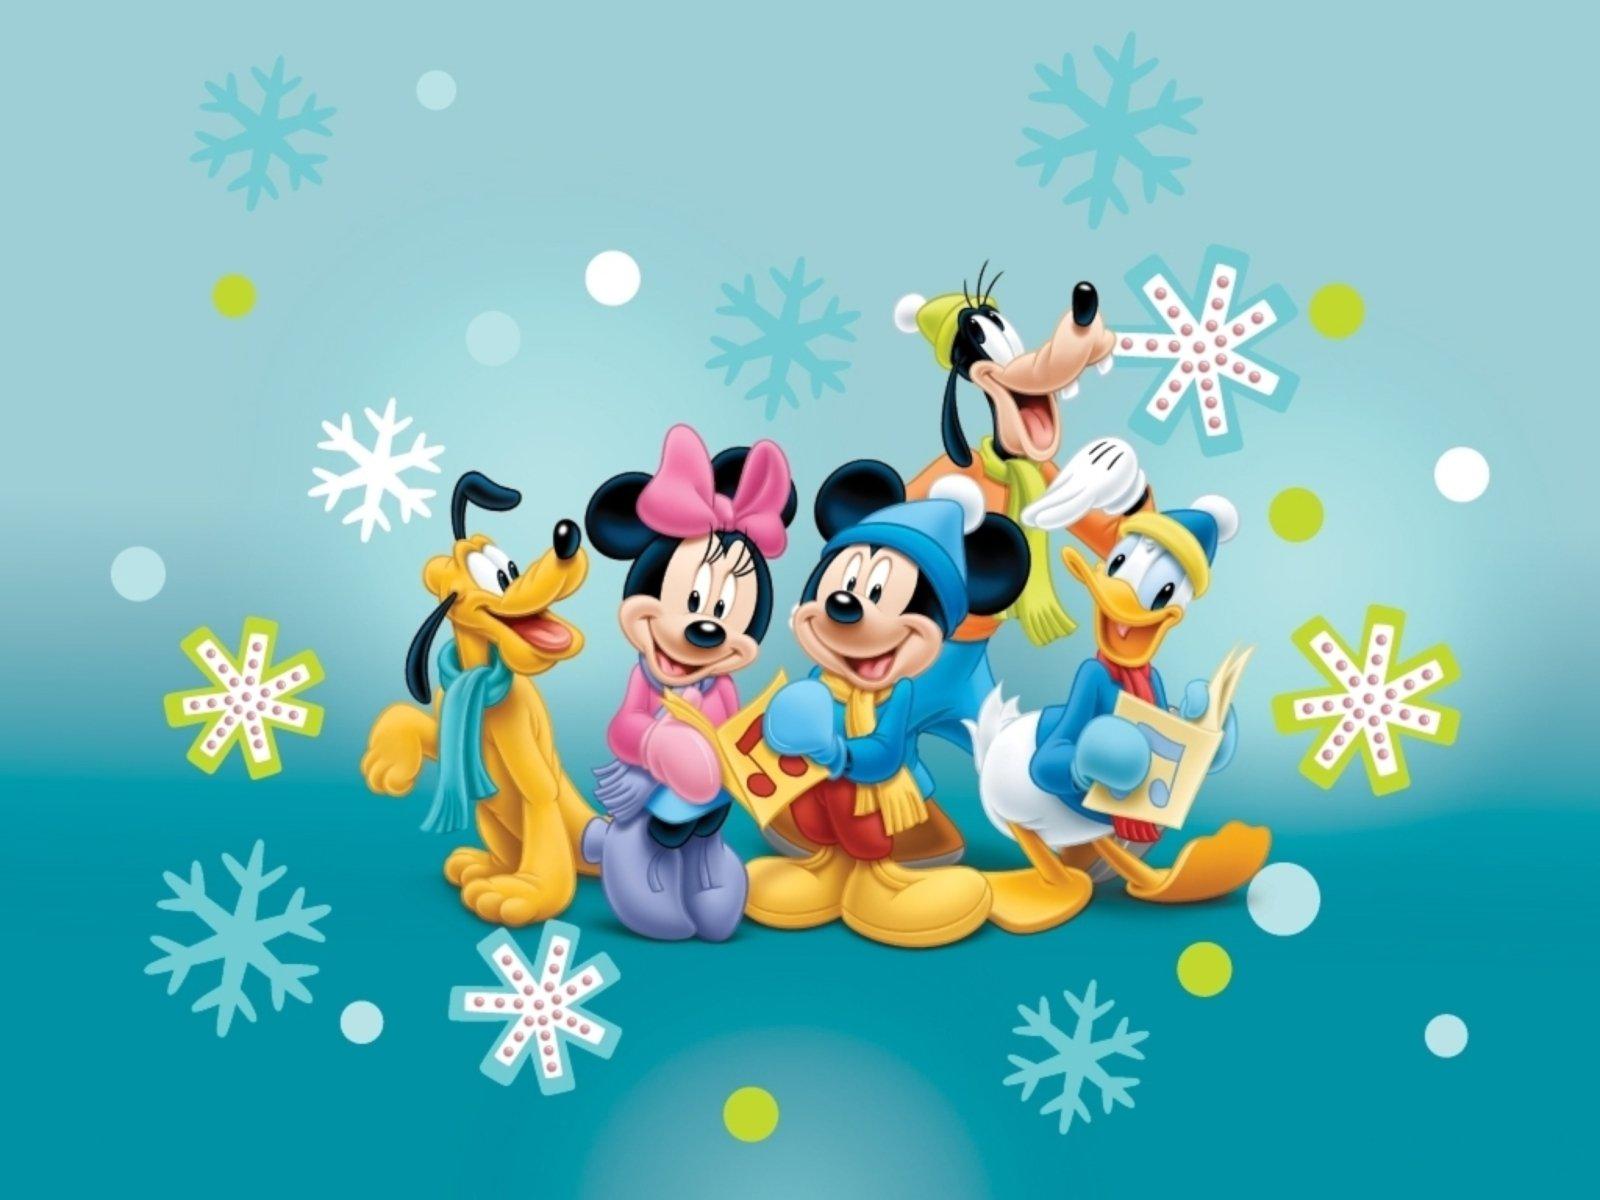 Disney Desktop Backgrounds Pictures 1600x1200